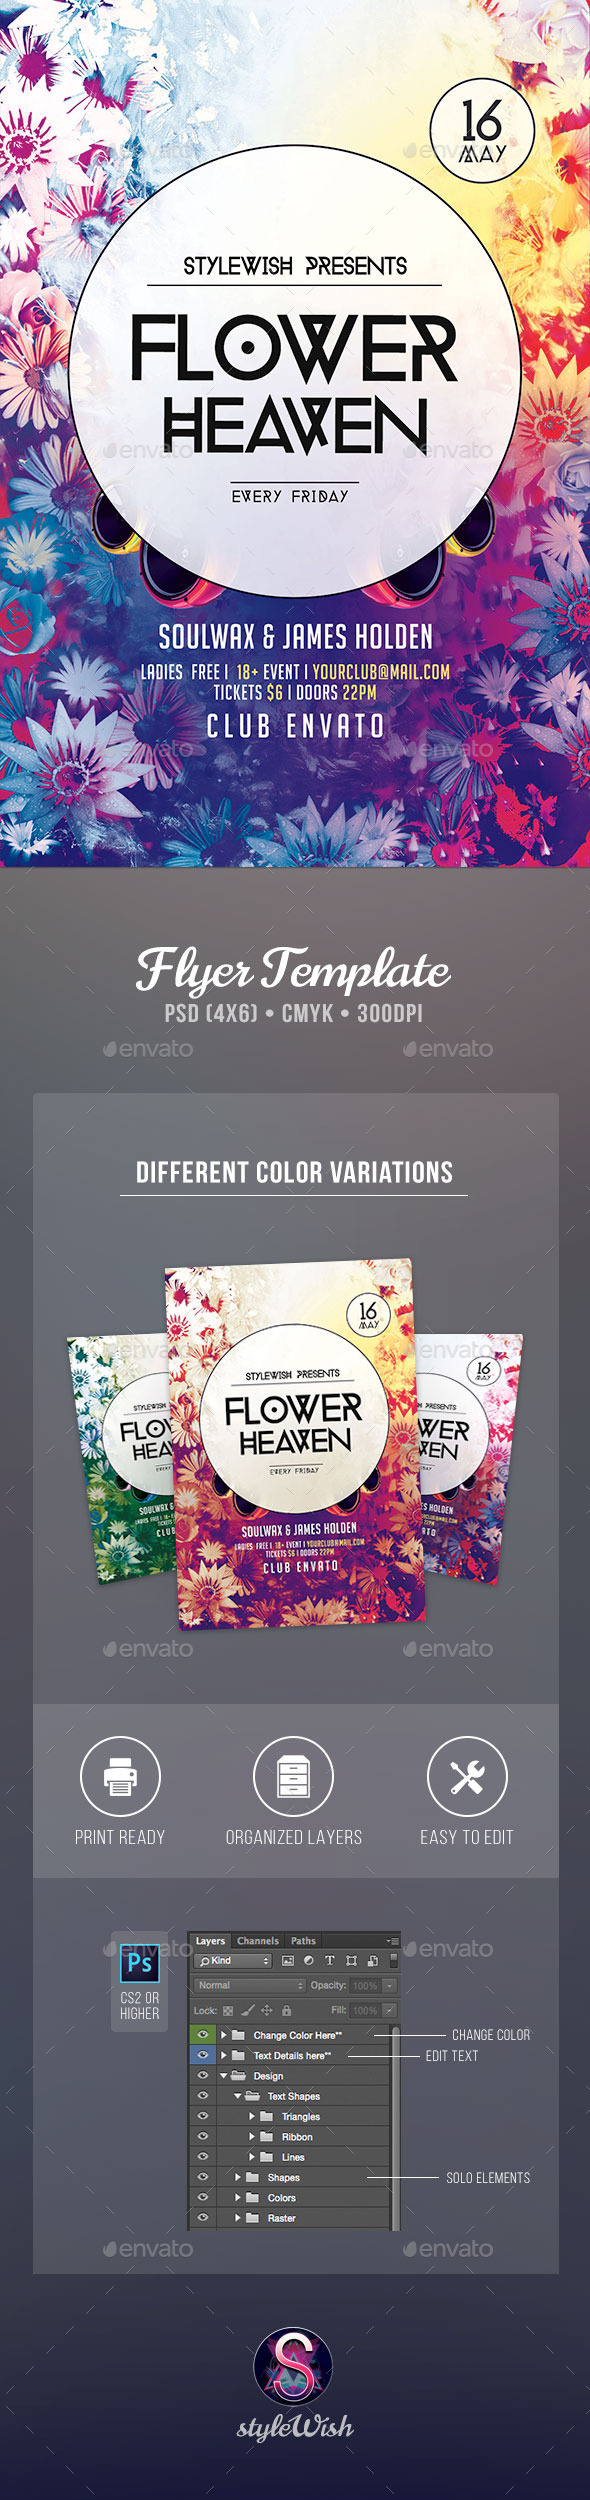 Flower Heaven Flyer - Clubs & Parties Events